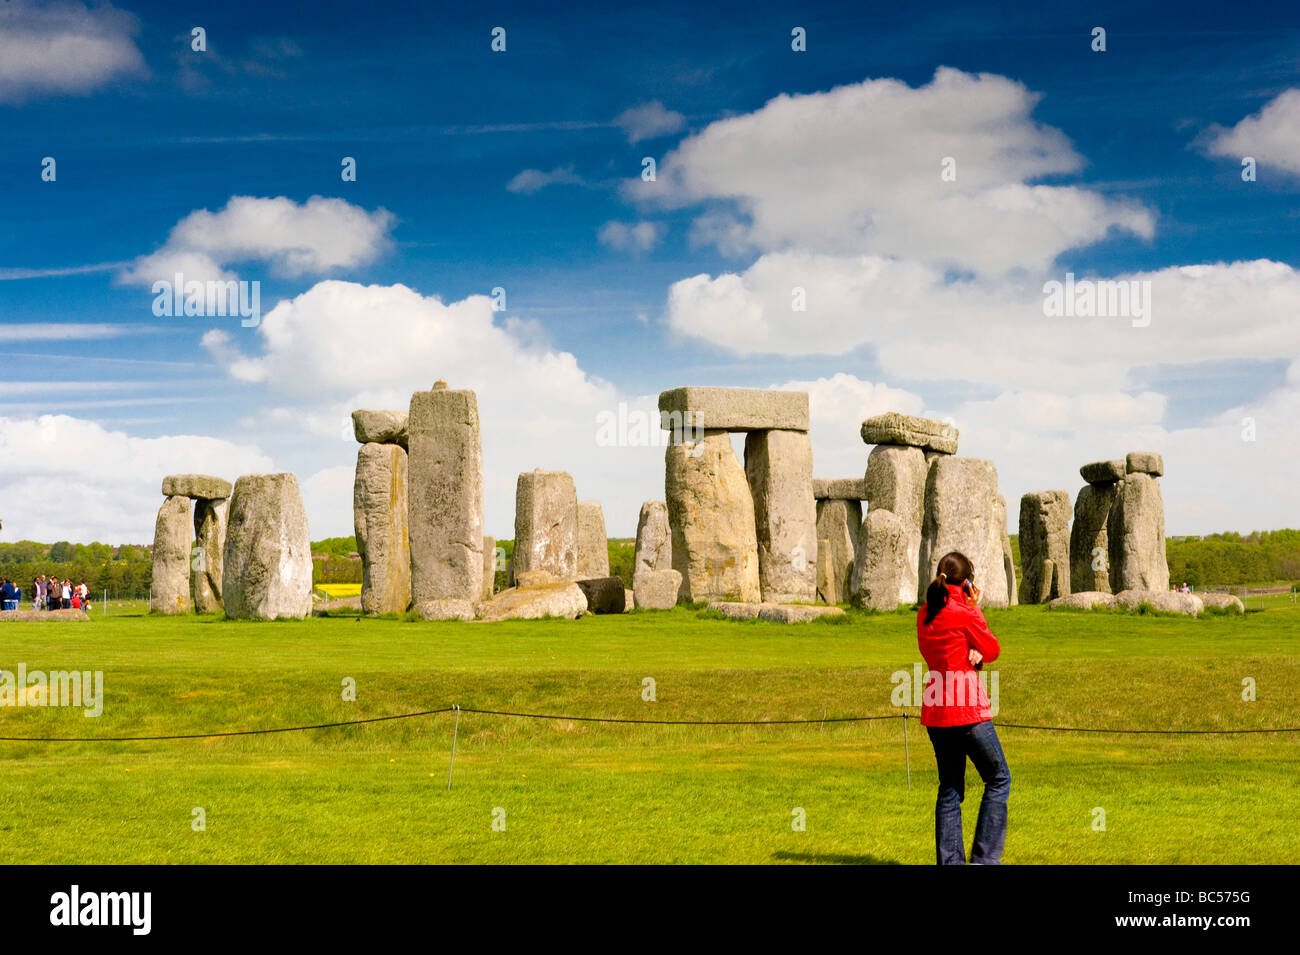 The ancient monument of Stonehenge Wiltshire England UK - Stock Image